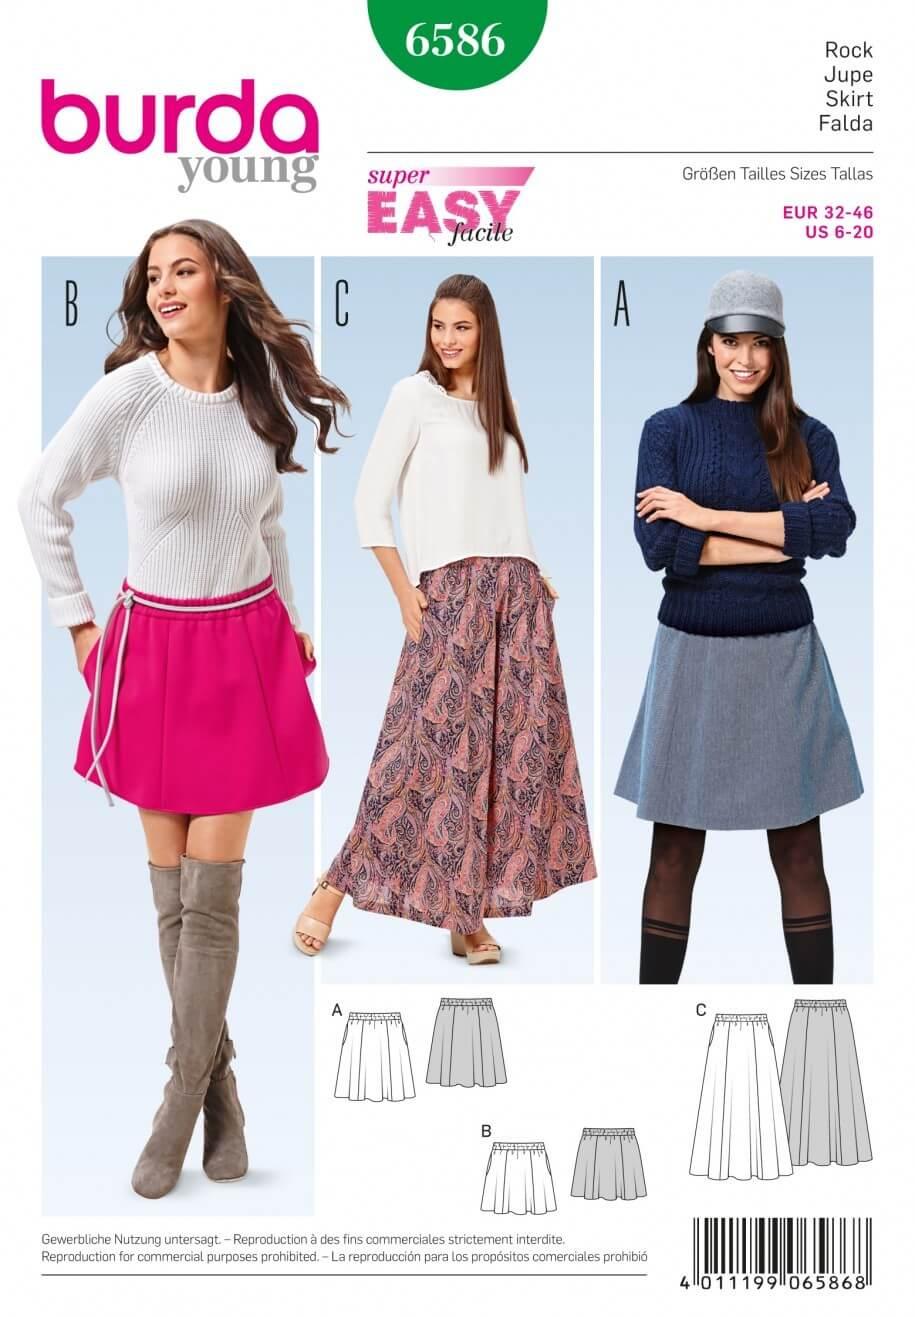 Burda Young Super Easy Mini, Midi or Maxi Skirt Sewing Pattern 6586